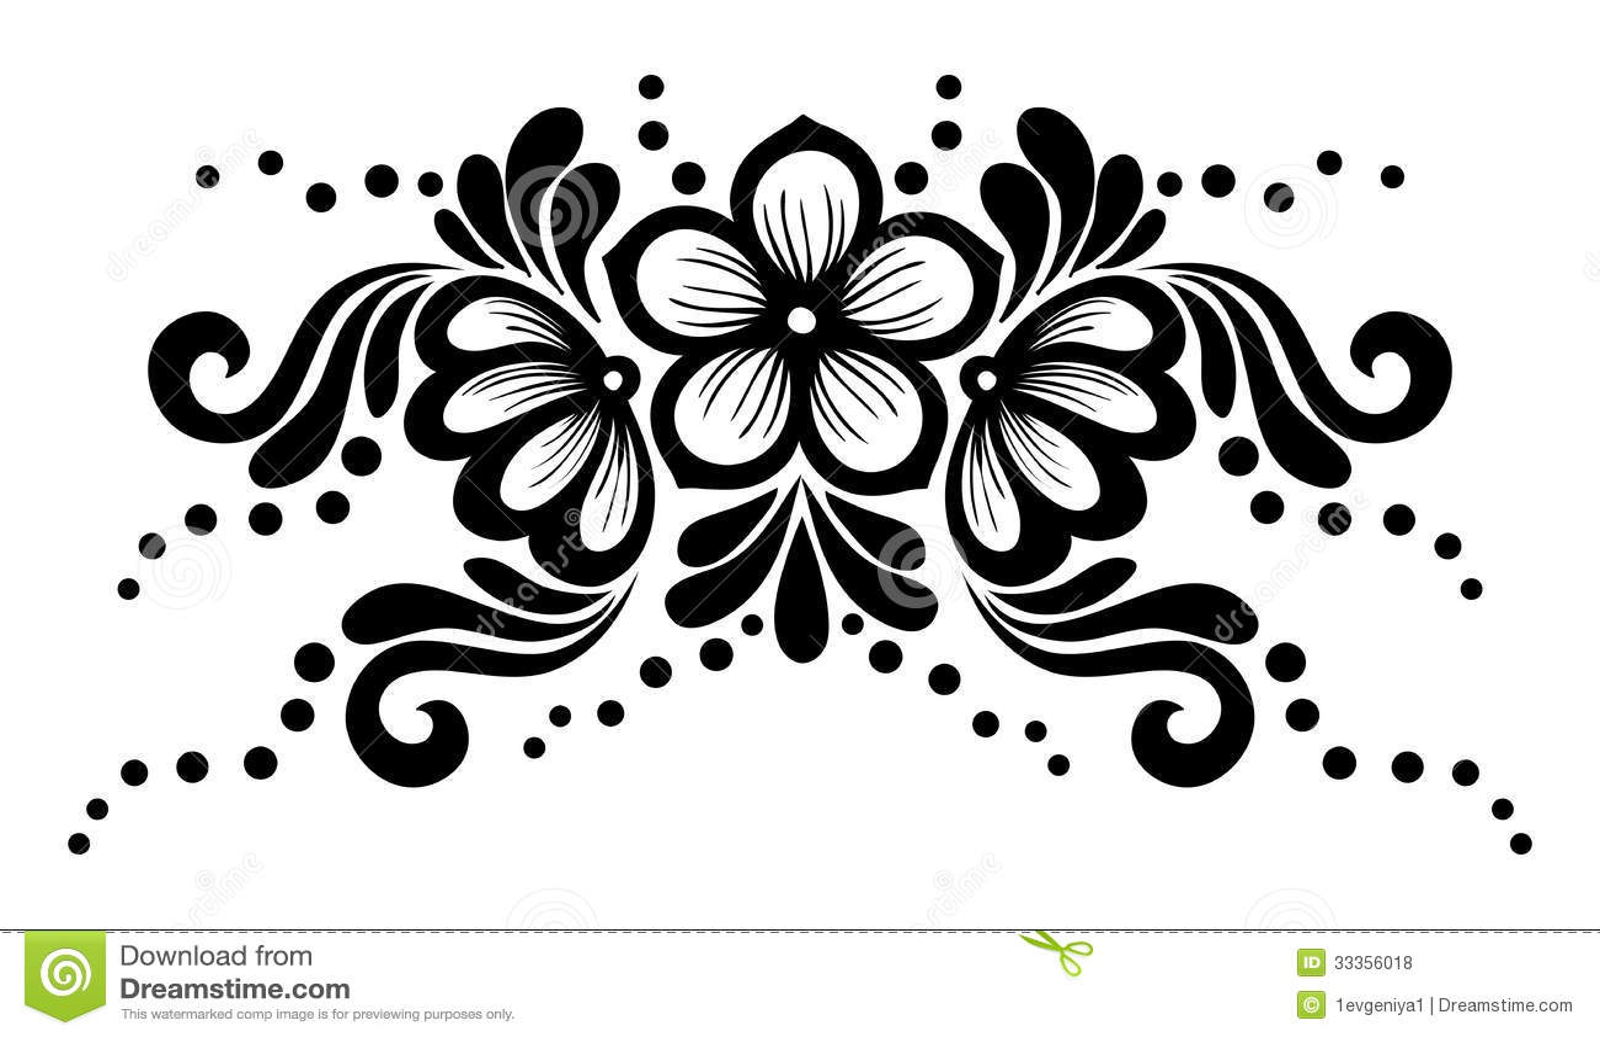 white floral designs